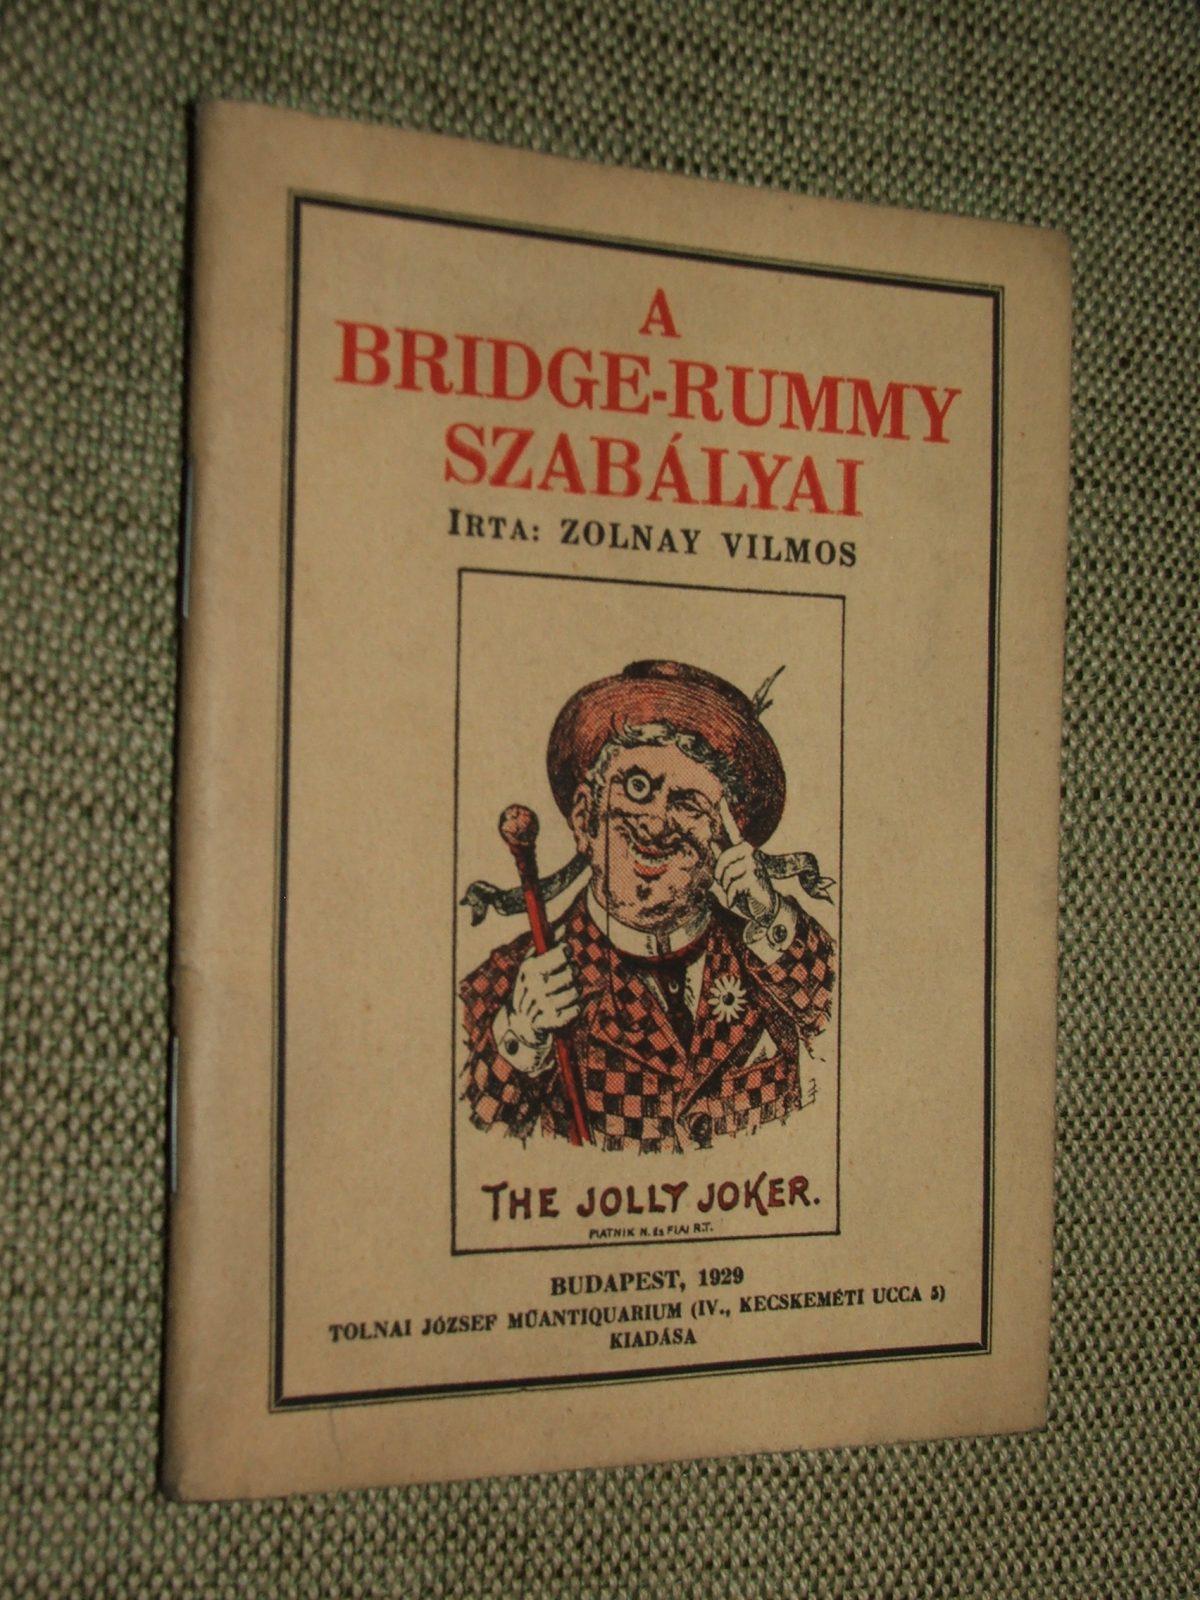 ZOLNAY Vilmos: A bridge-rummy szabályai